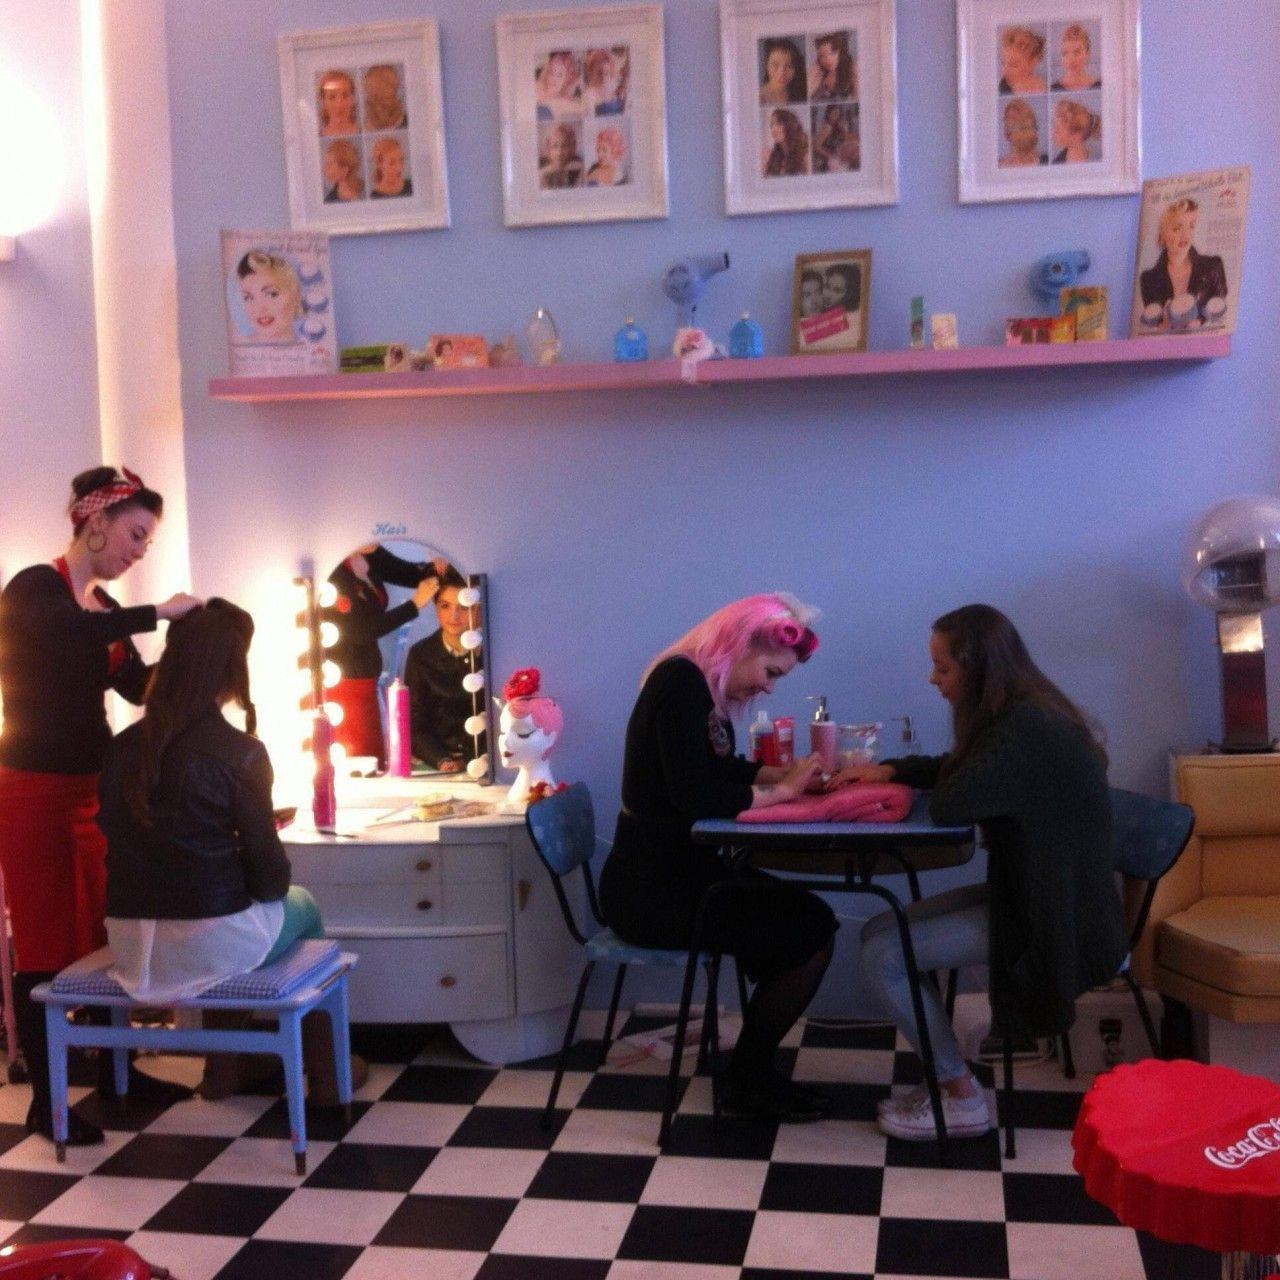 16 Decoracion Vintage Para Salon De Belleza 16  Retro salon